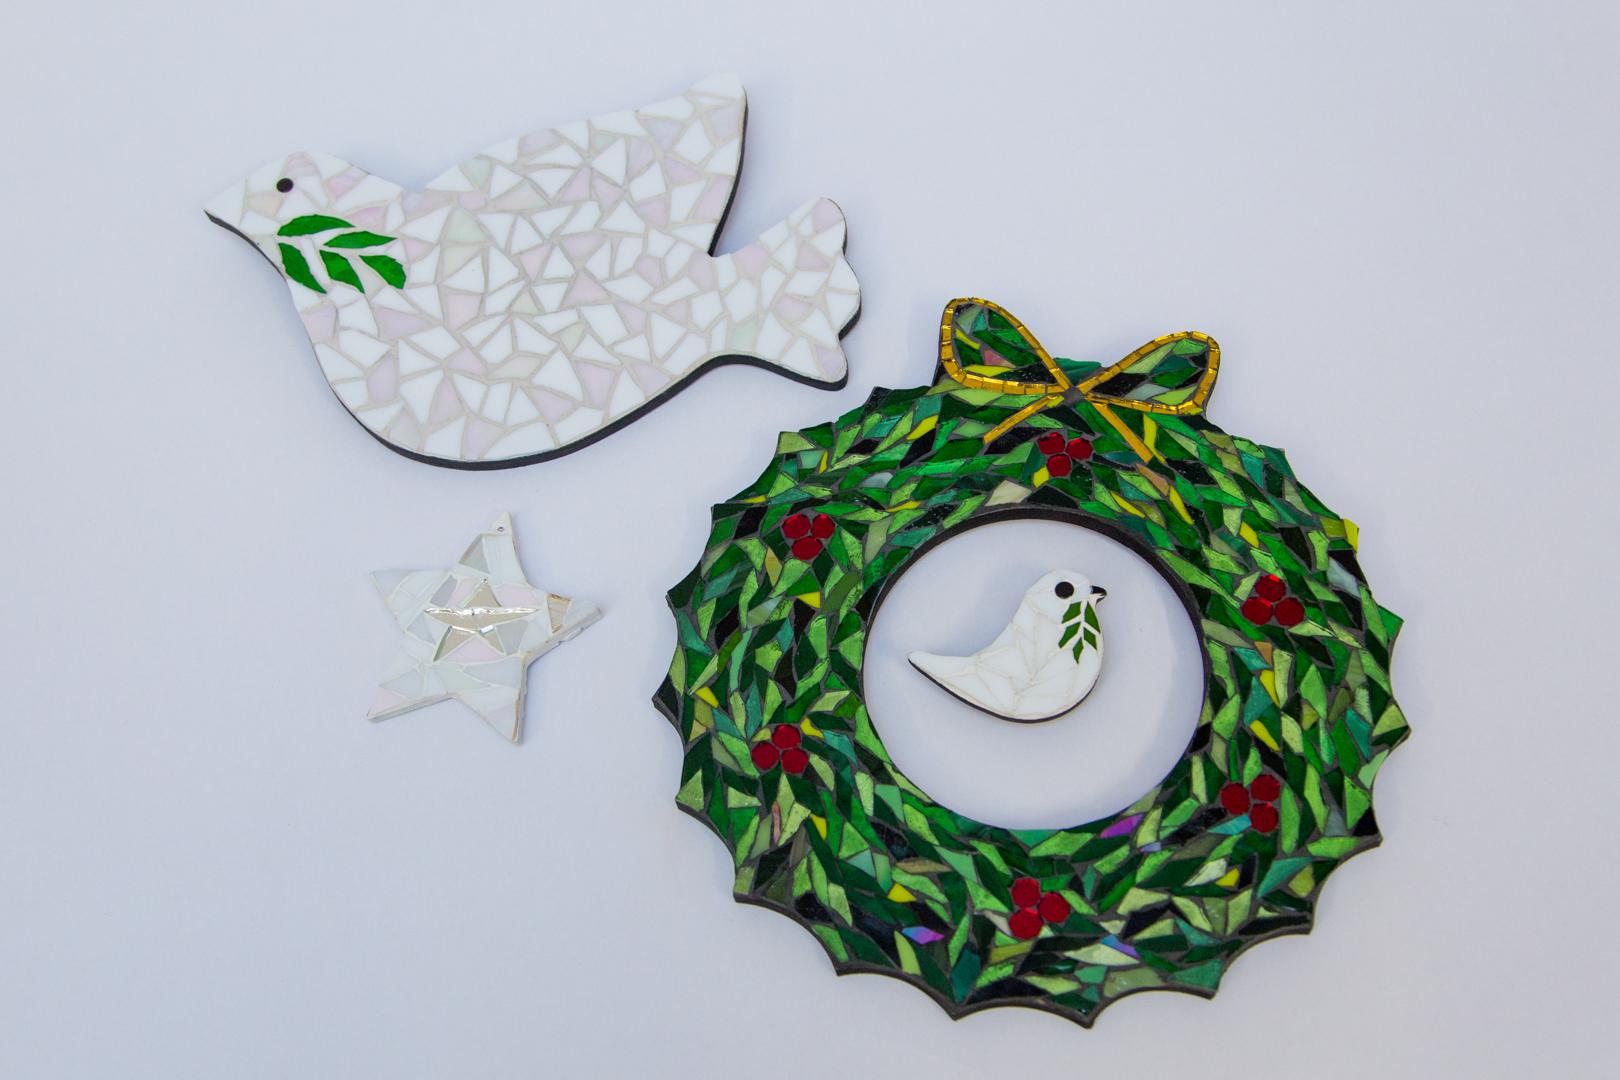 Janet Ventre Mosaic - Mosaic Christmas decorations:Dove - £40 Wreath - £50Christmas tree decorations - £15 eachBuy at Janet's Cockington Court studio